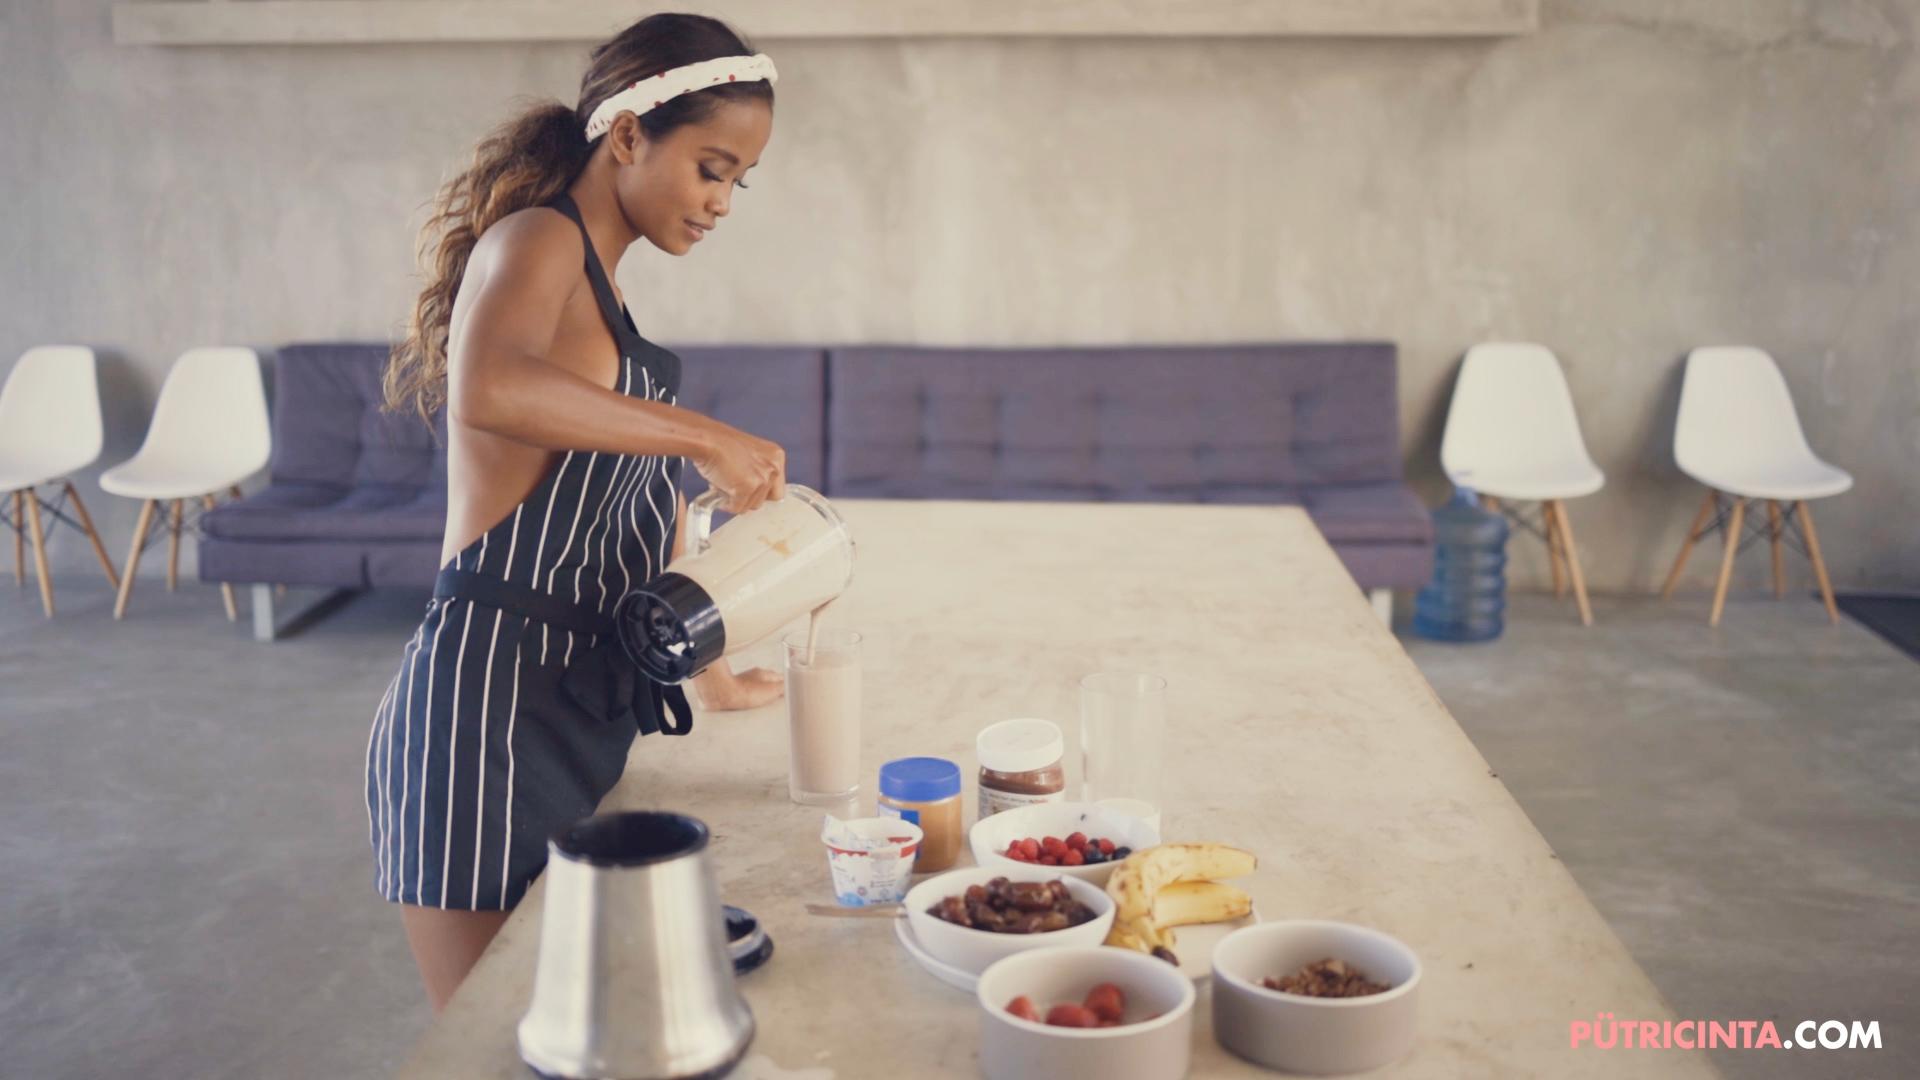 028-Putri-Cinta-Cooking-Class-mainvid-stills-34.jpg